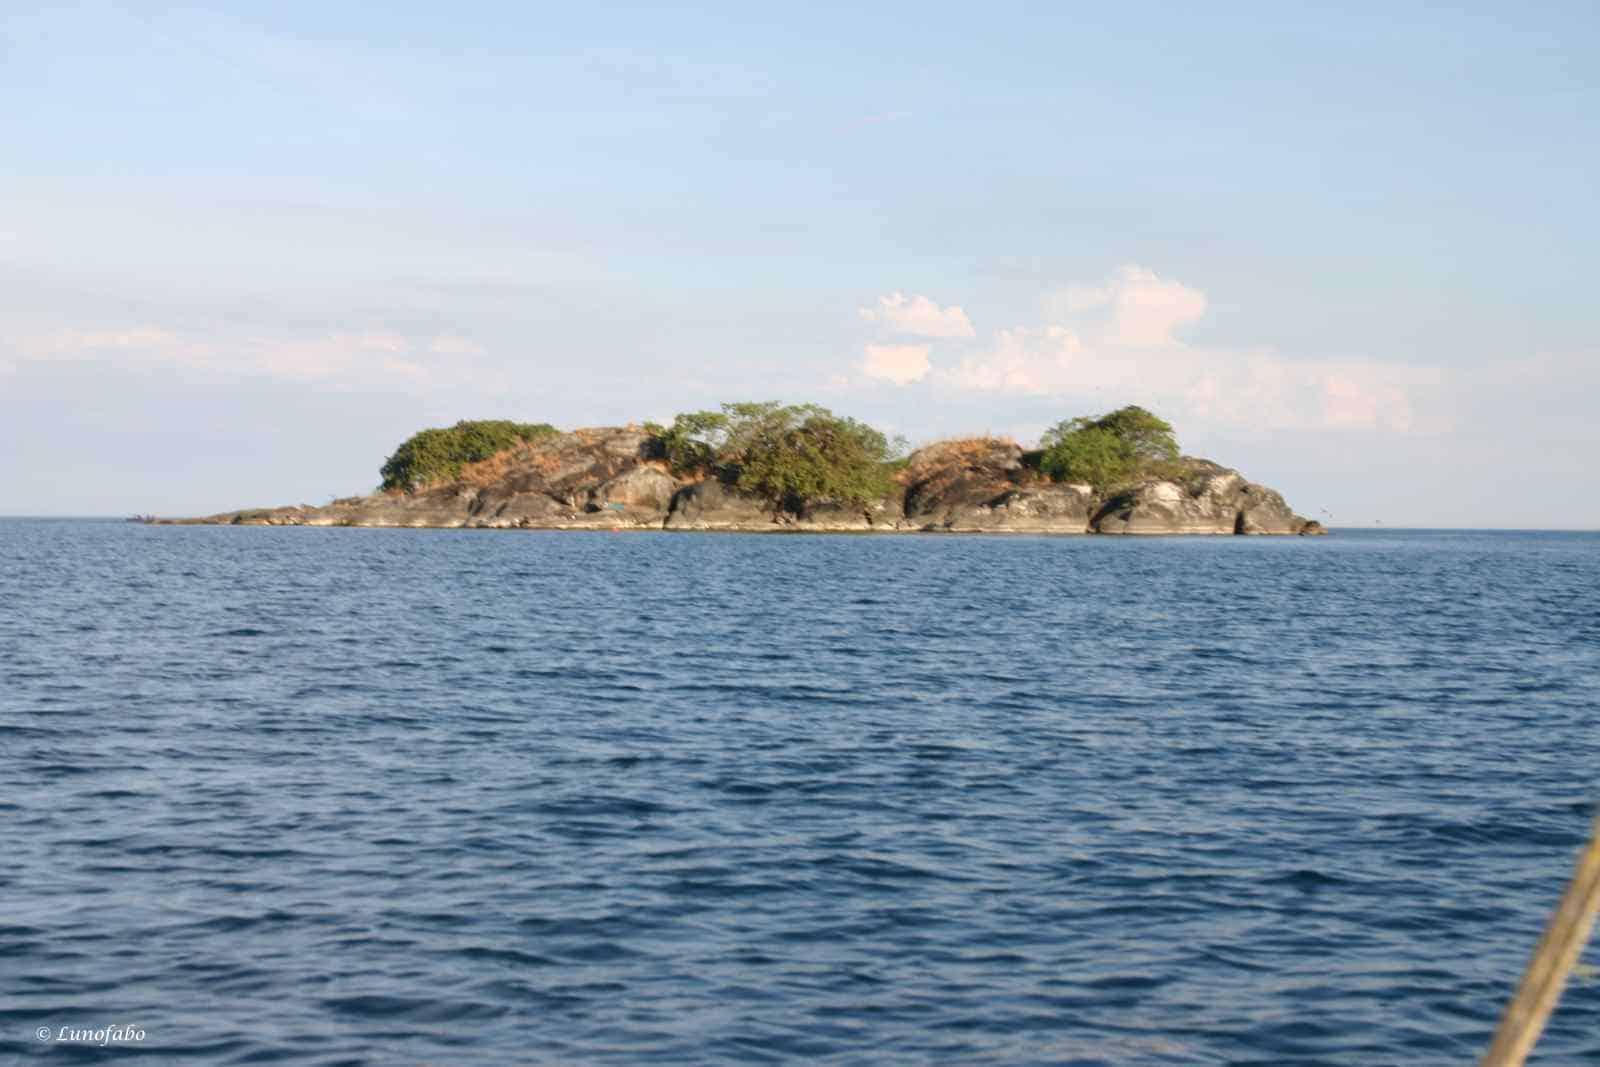 Boadzulu Island